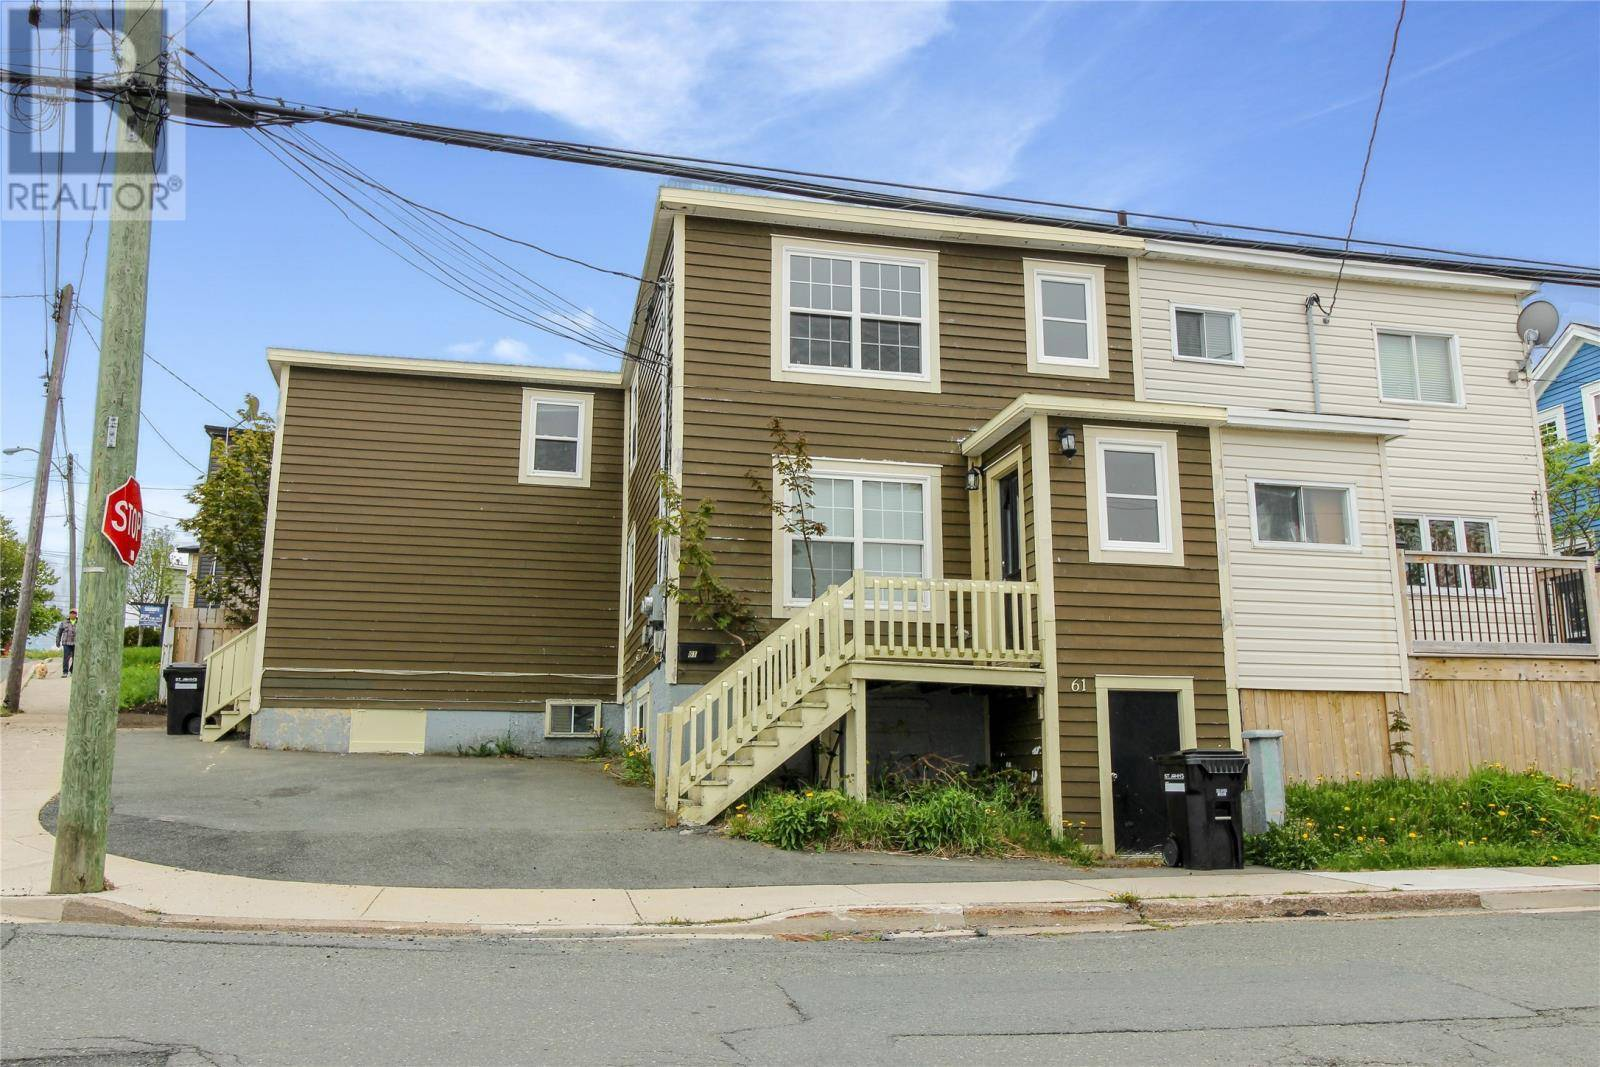 61 Calver Avenue, St. John's | Image 1